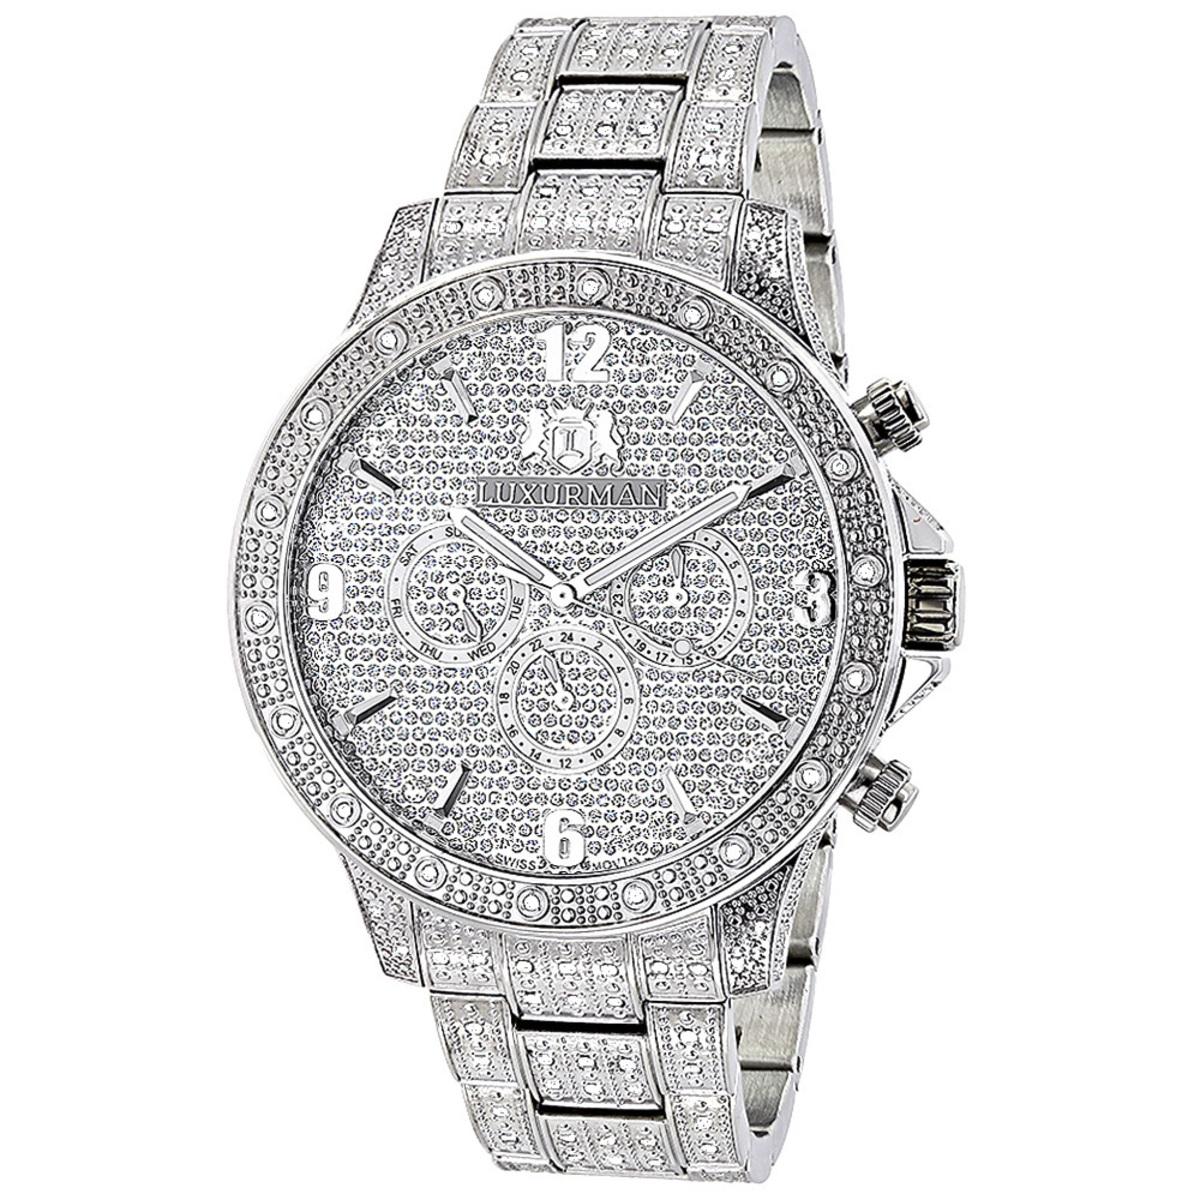 Mens Diamond Watches Fully Iced Out Watch 1.25ct Luxurman Liberty Swiss Mvt